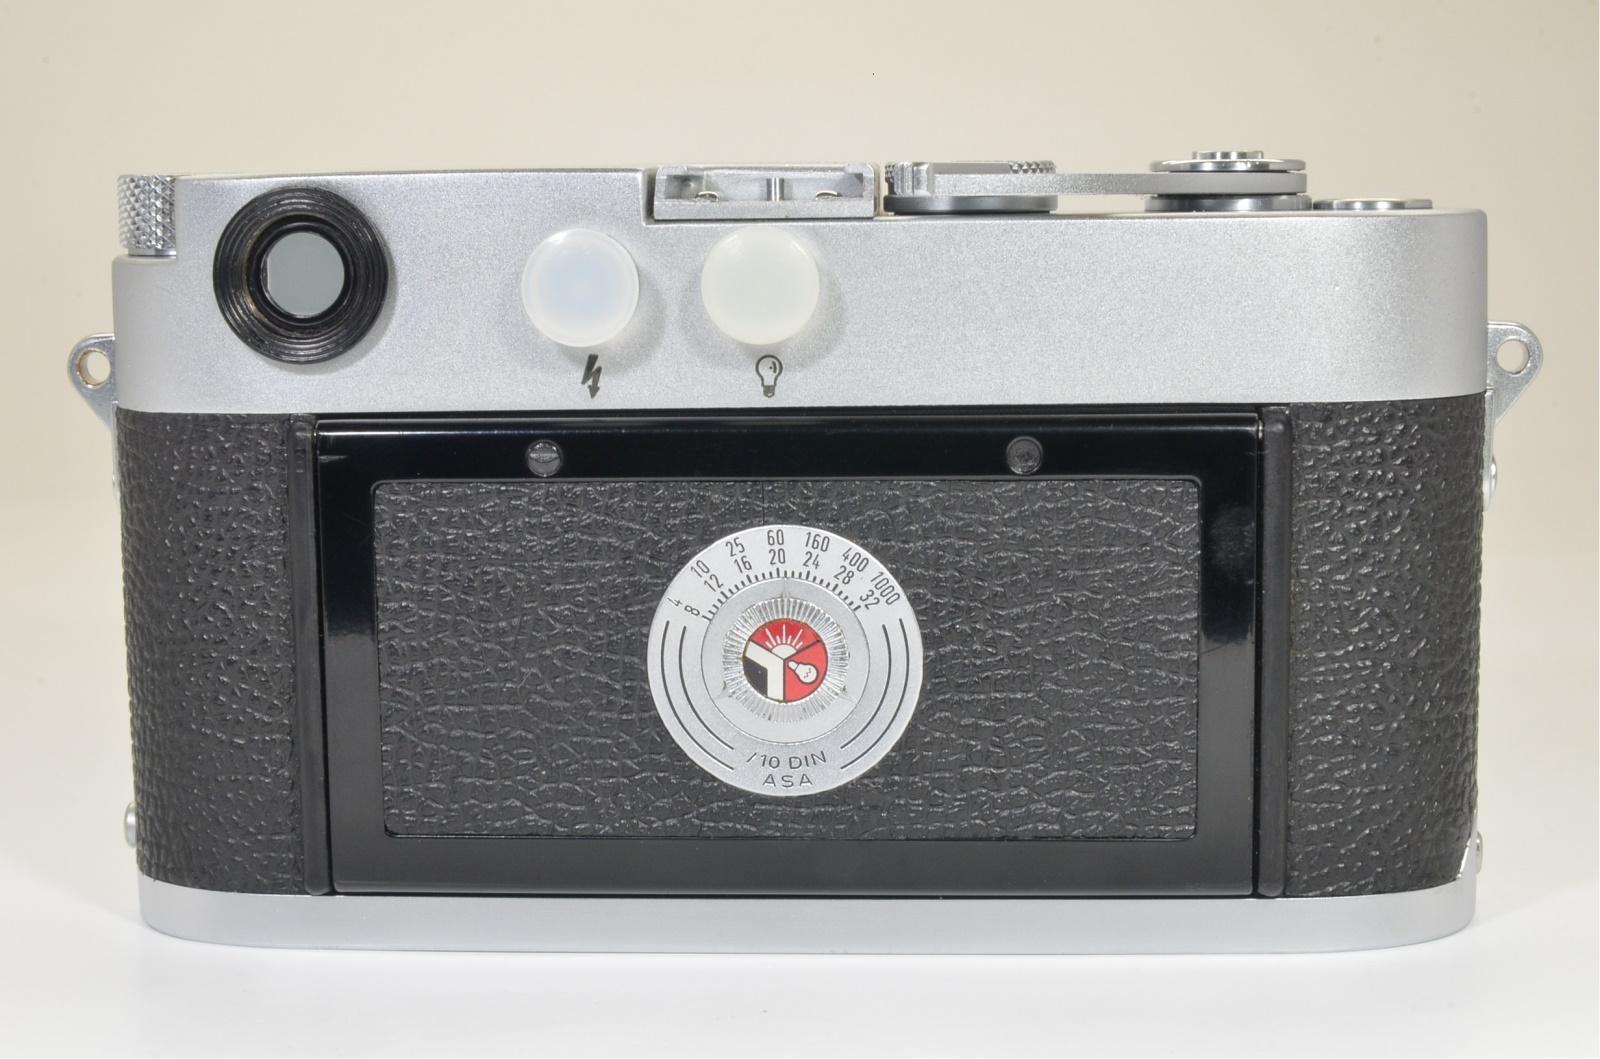 leica m3 single stroke film camera s/n 895309 year 1957 shooting tested